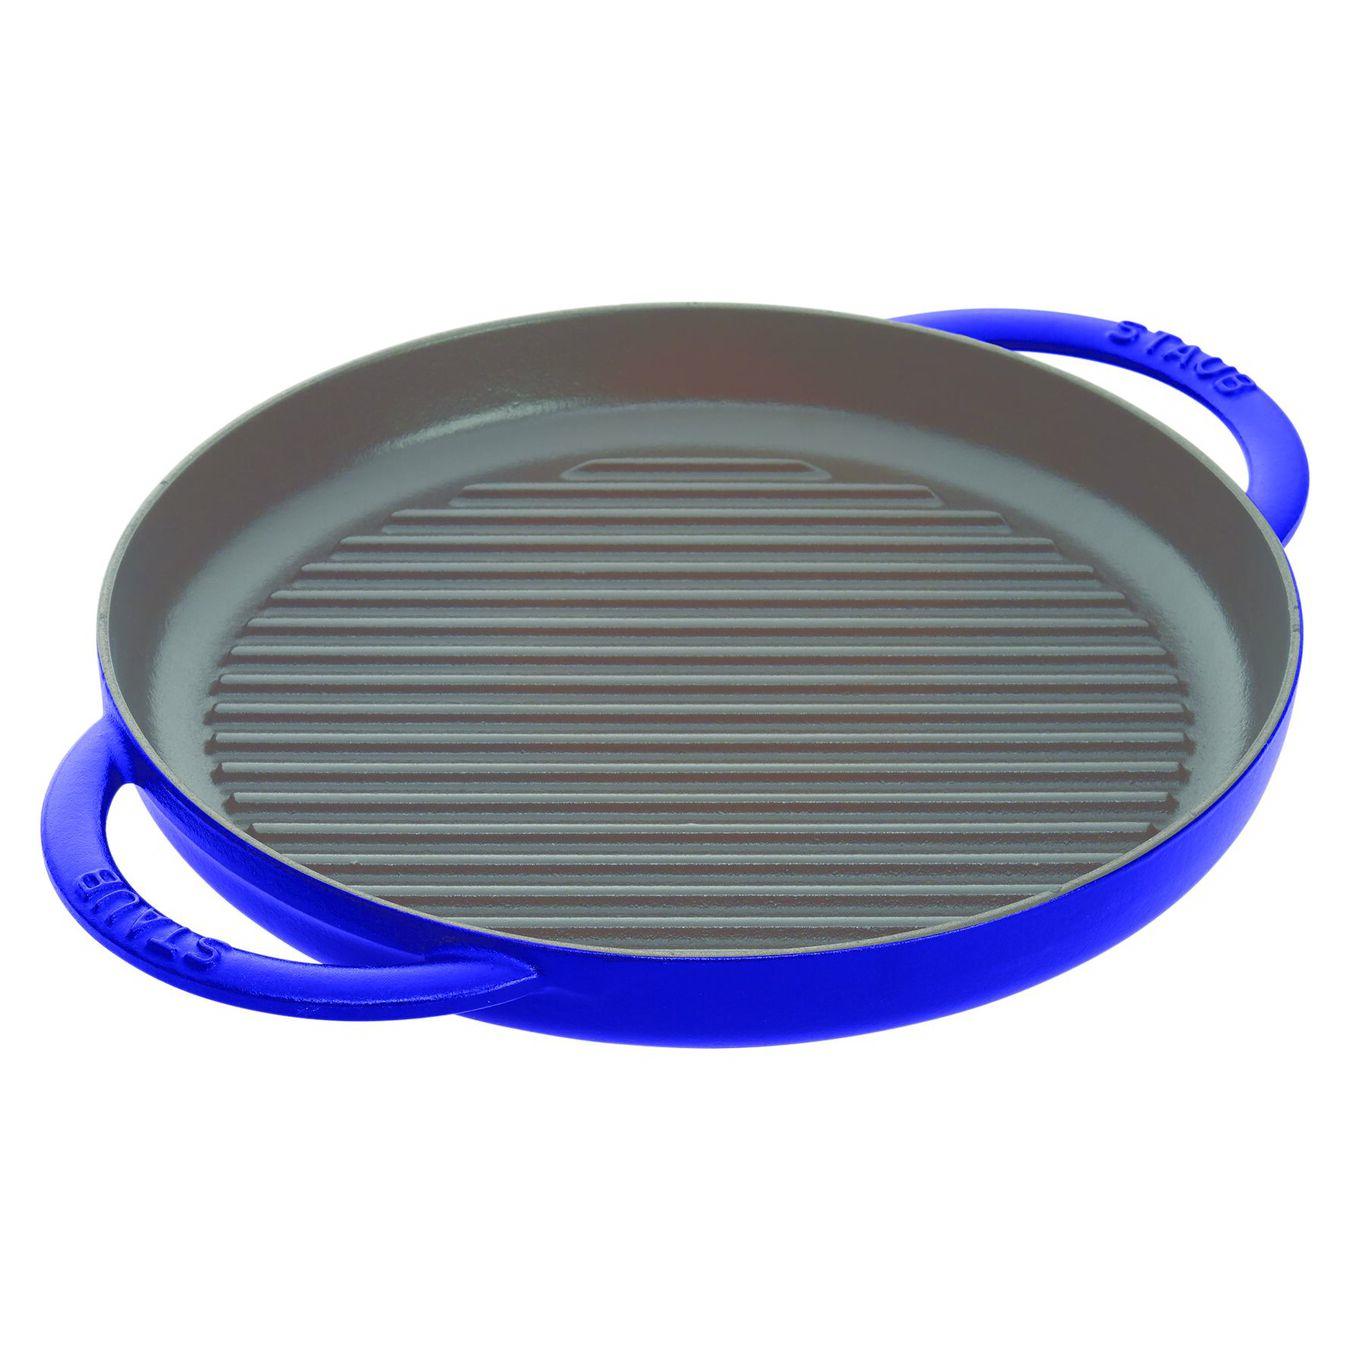 Pure Grill 26 cm, rund, Dunkelblau, Gusseisen,,large 2